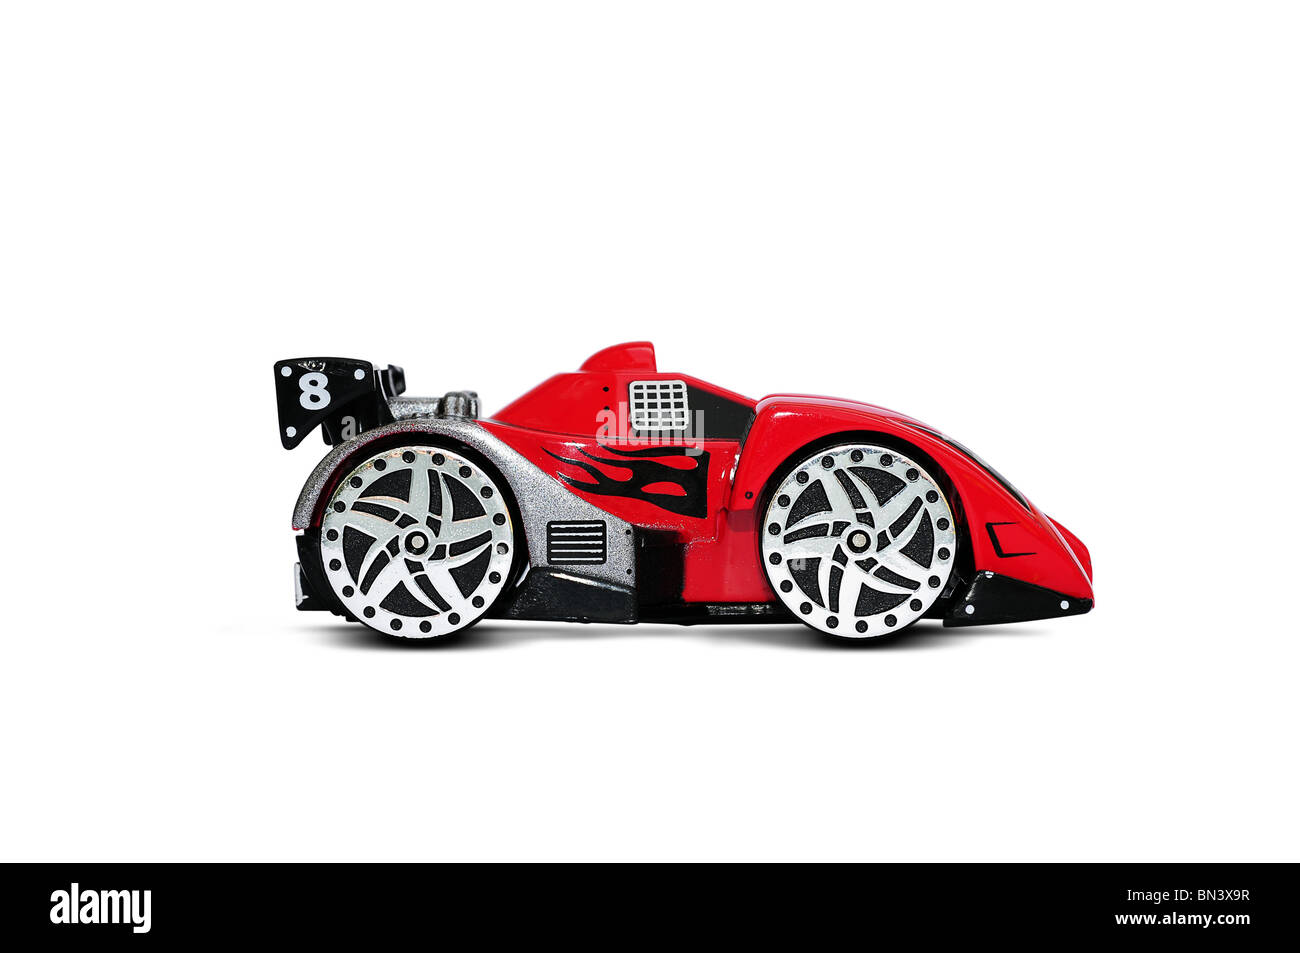 Toy racing car - Stock Image